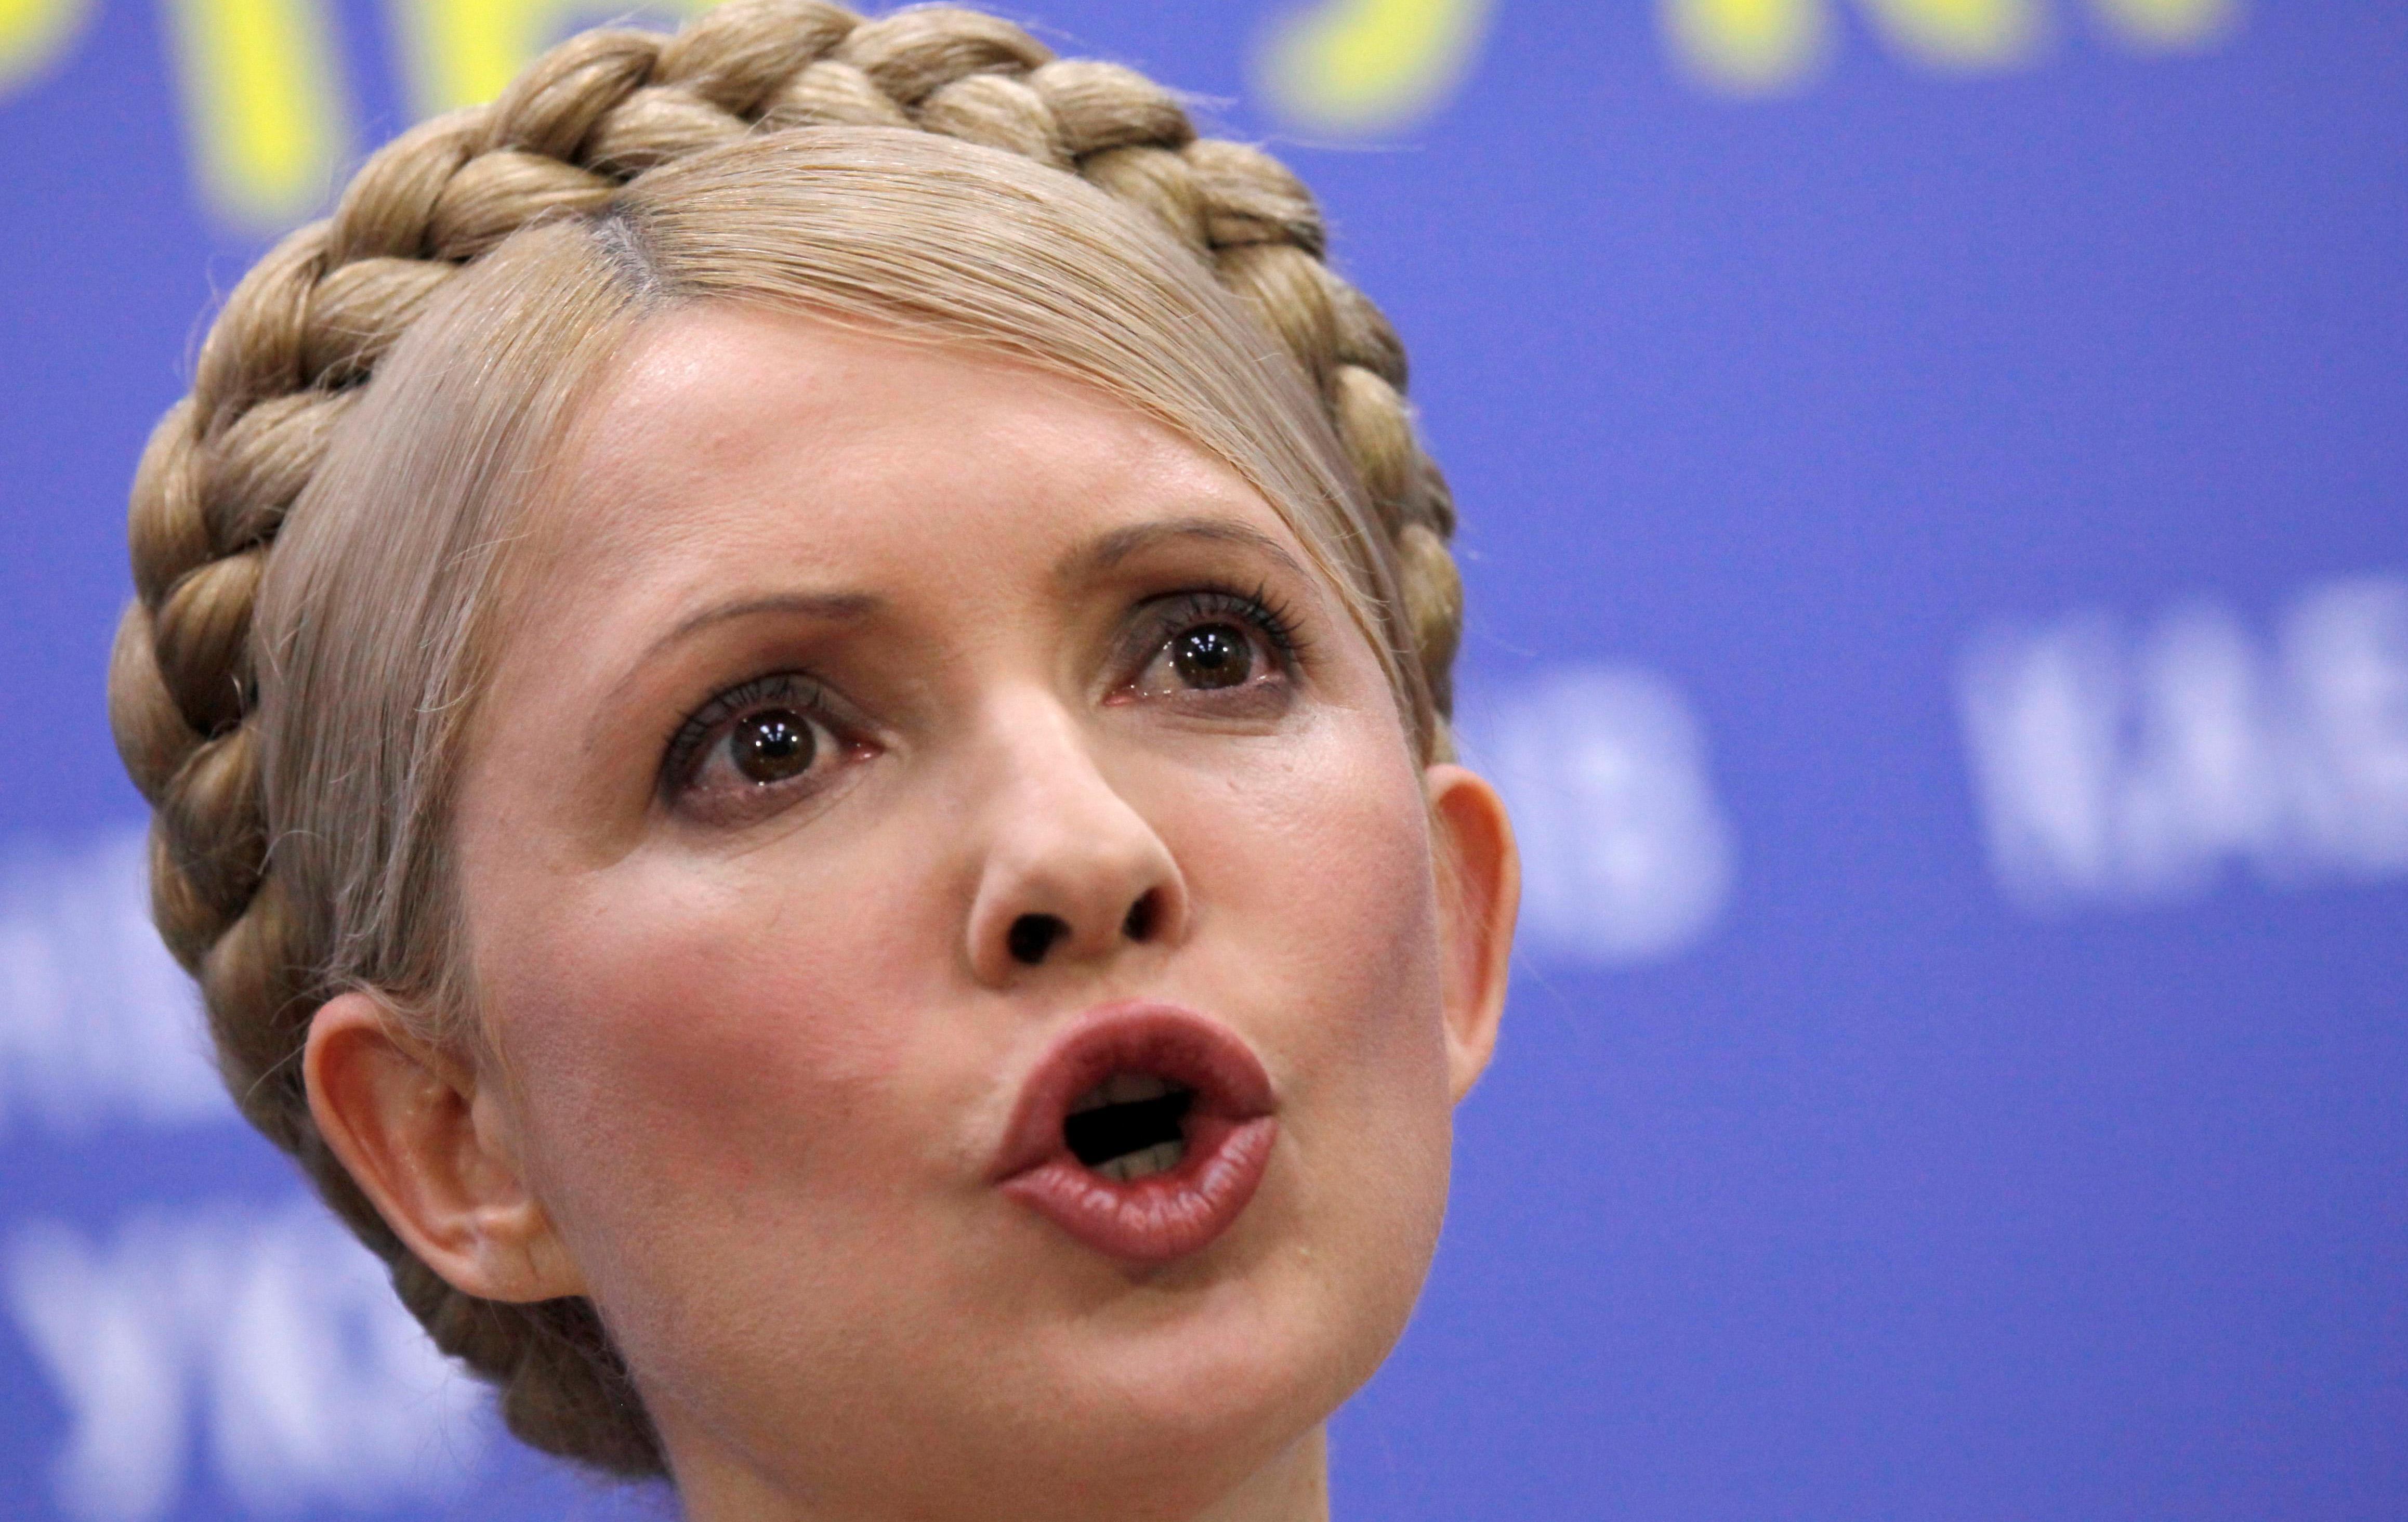 тимошенко ебут в рот онлайн очень рада